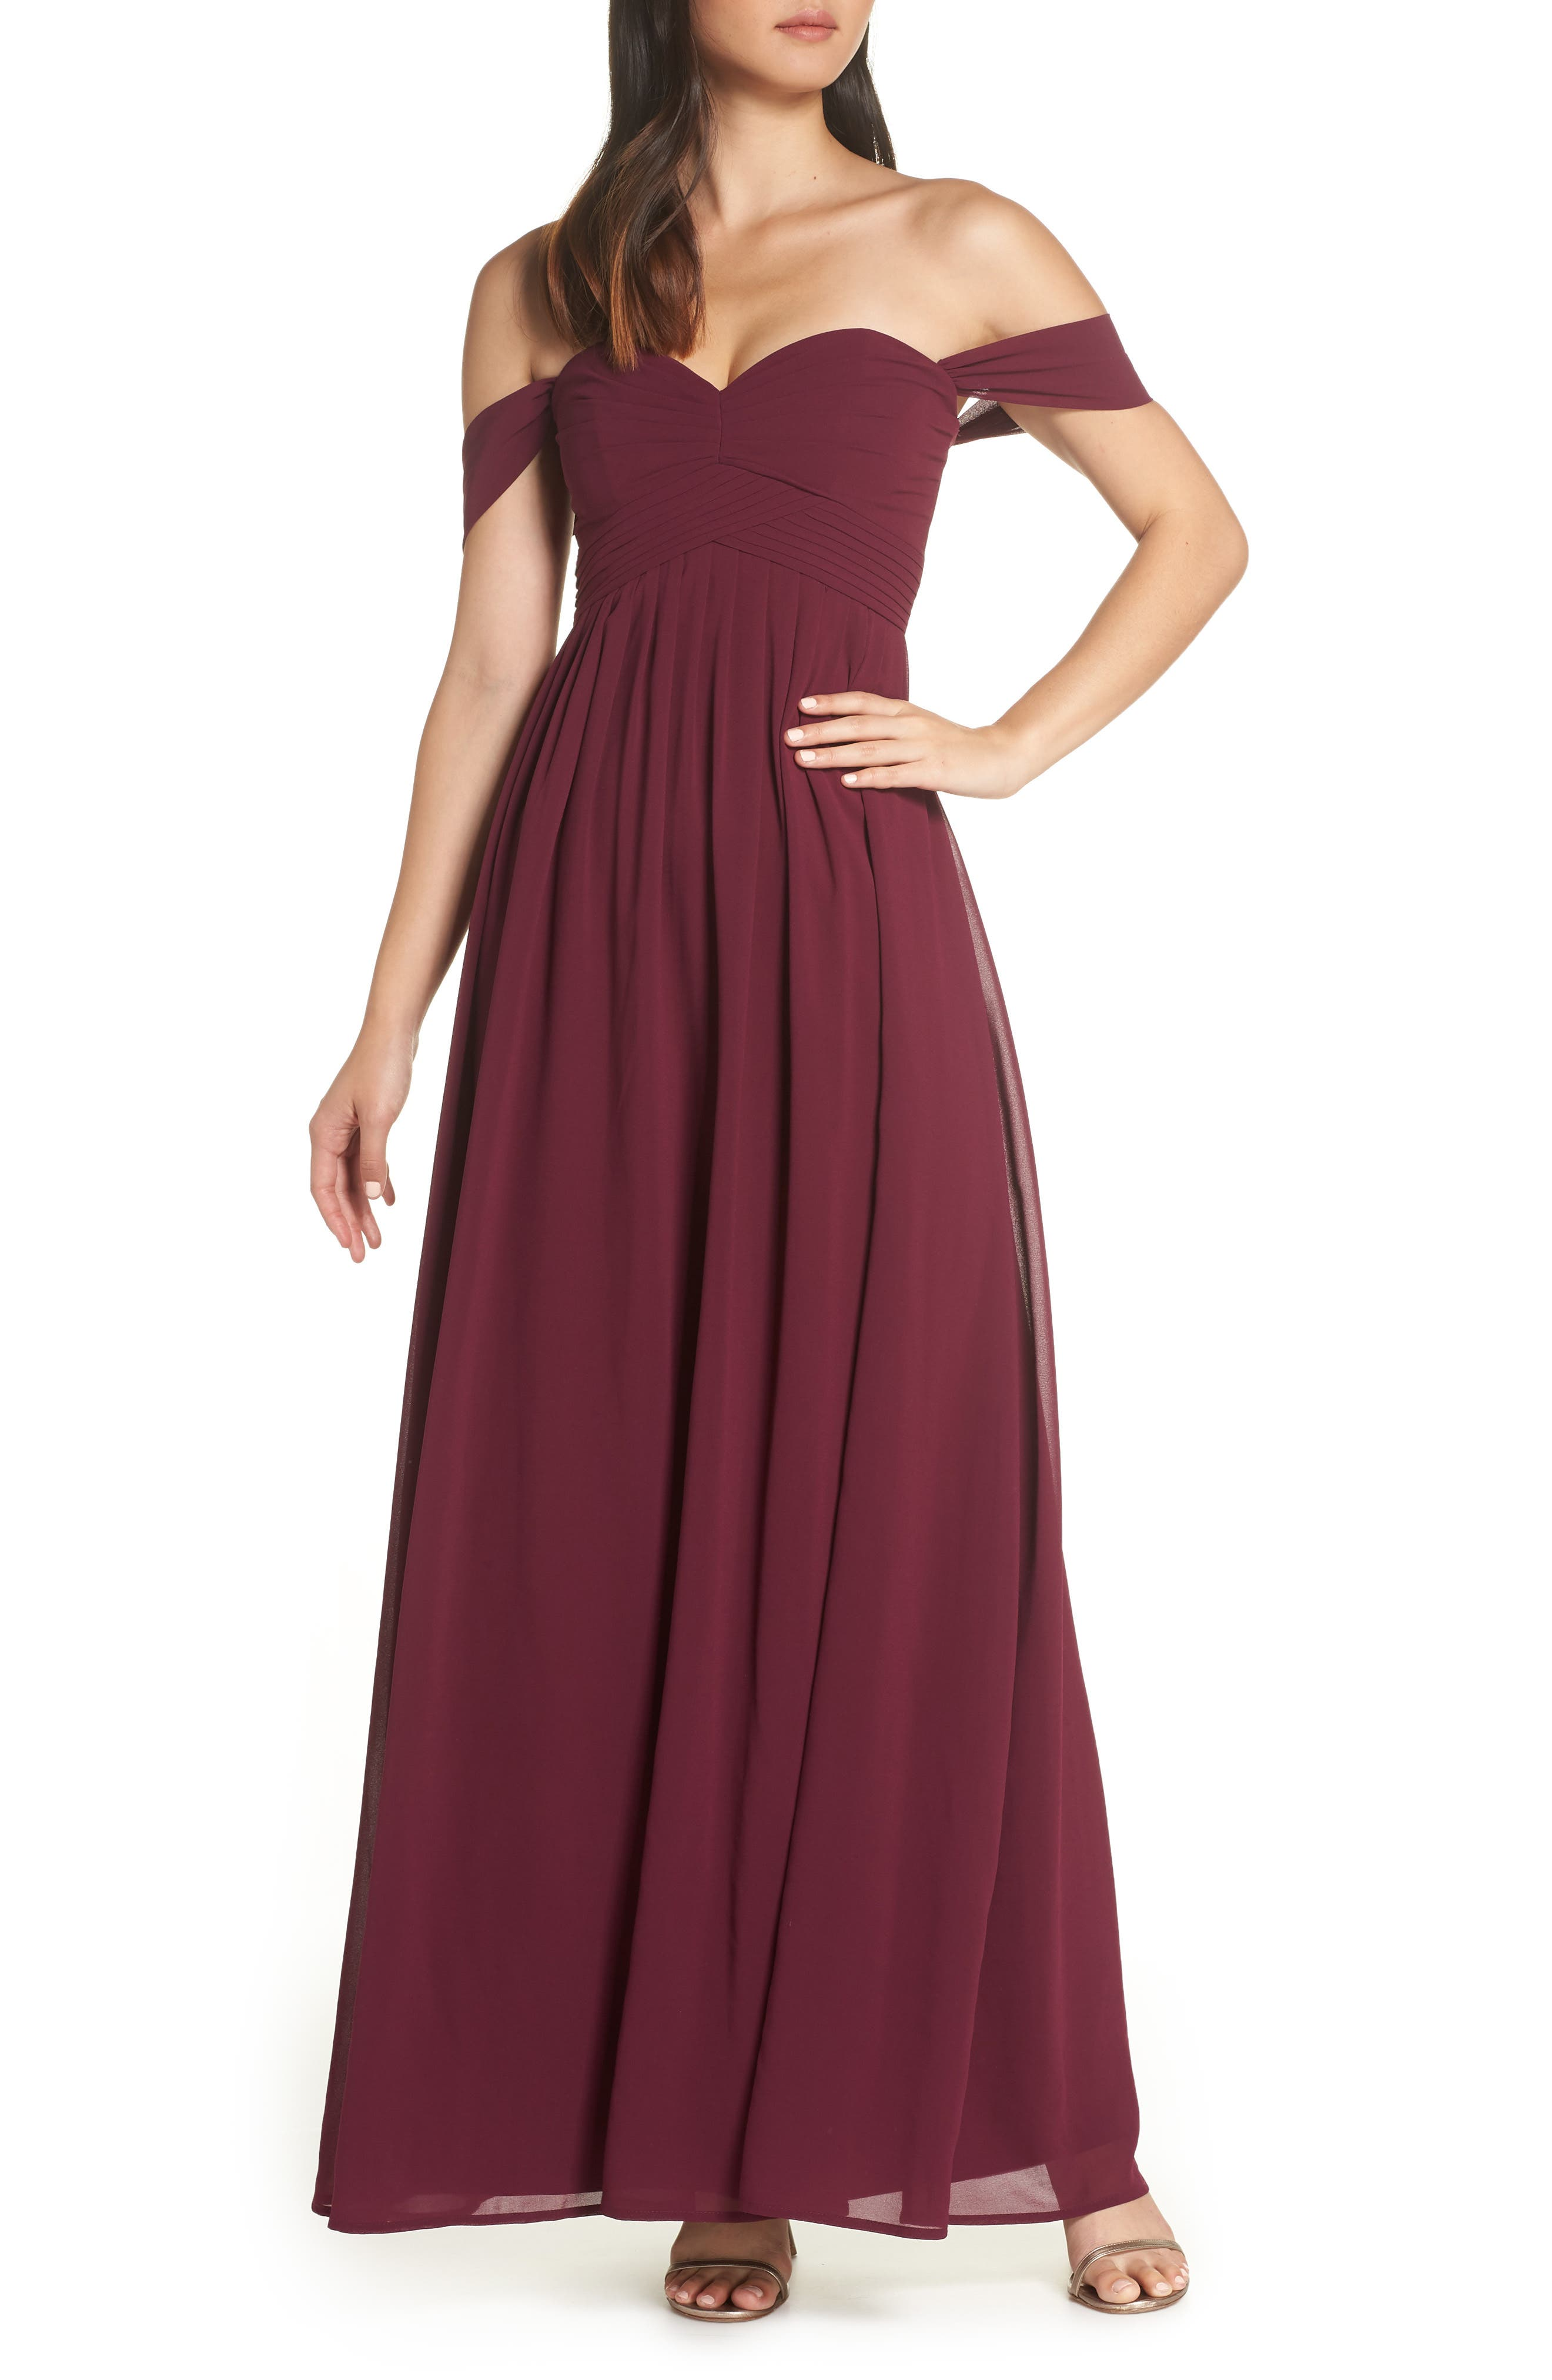 Lulus Convertible Neckline Chiffon Gown